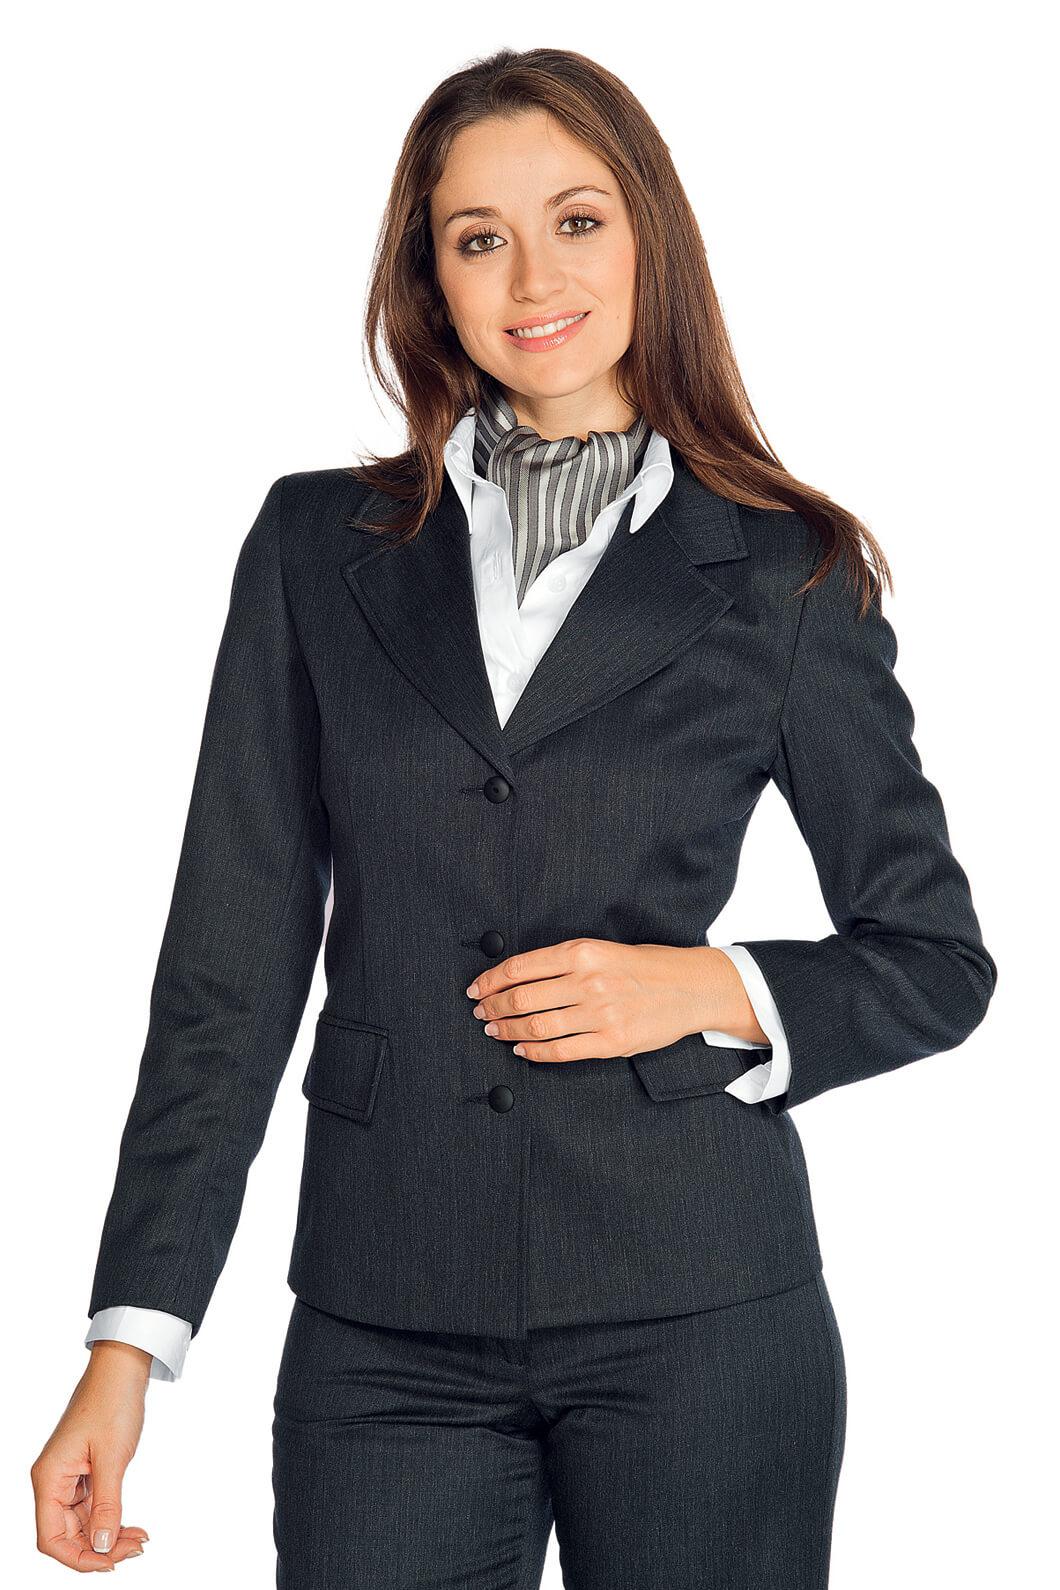 veste femme mi saison portland anthracite hotellerie tailleur uniforme femme. Black Bedroom Furniture Sets. Home Design Ideas